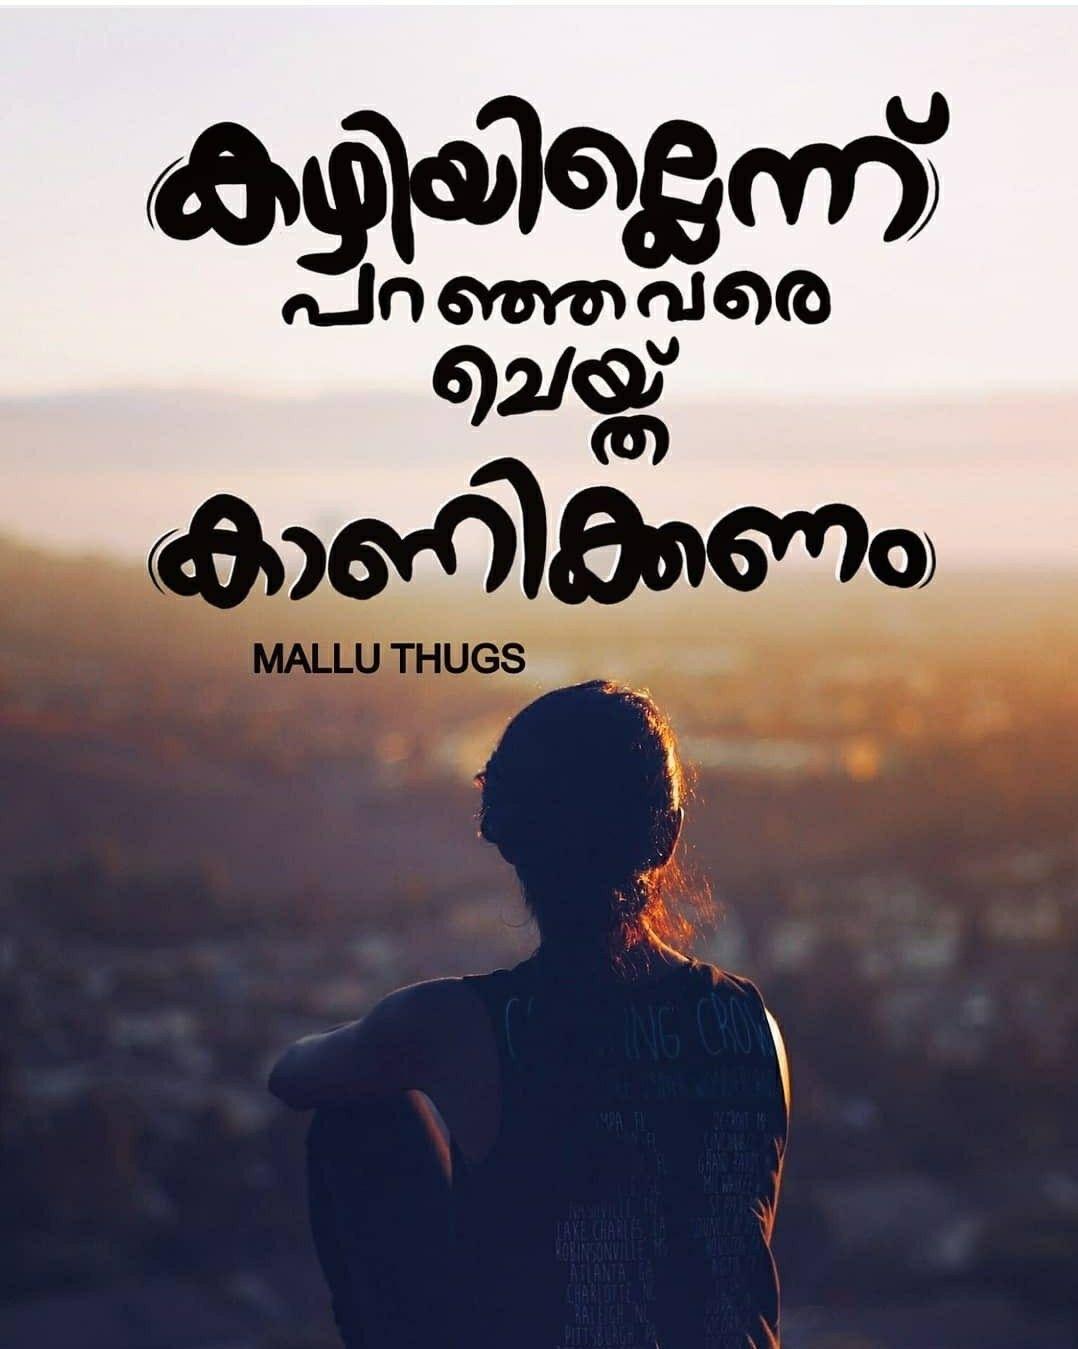 Pin By Micky Bathool On Malayalam Quotes Nostalgic Quote Self Respect Quotes Malayalam Quotes